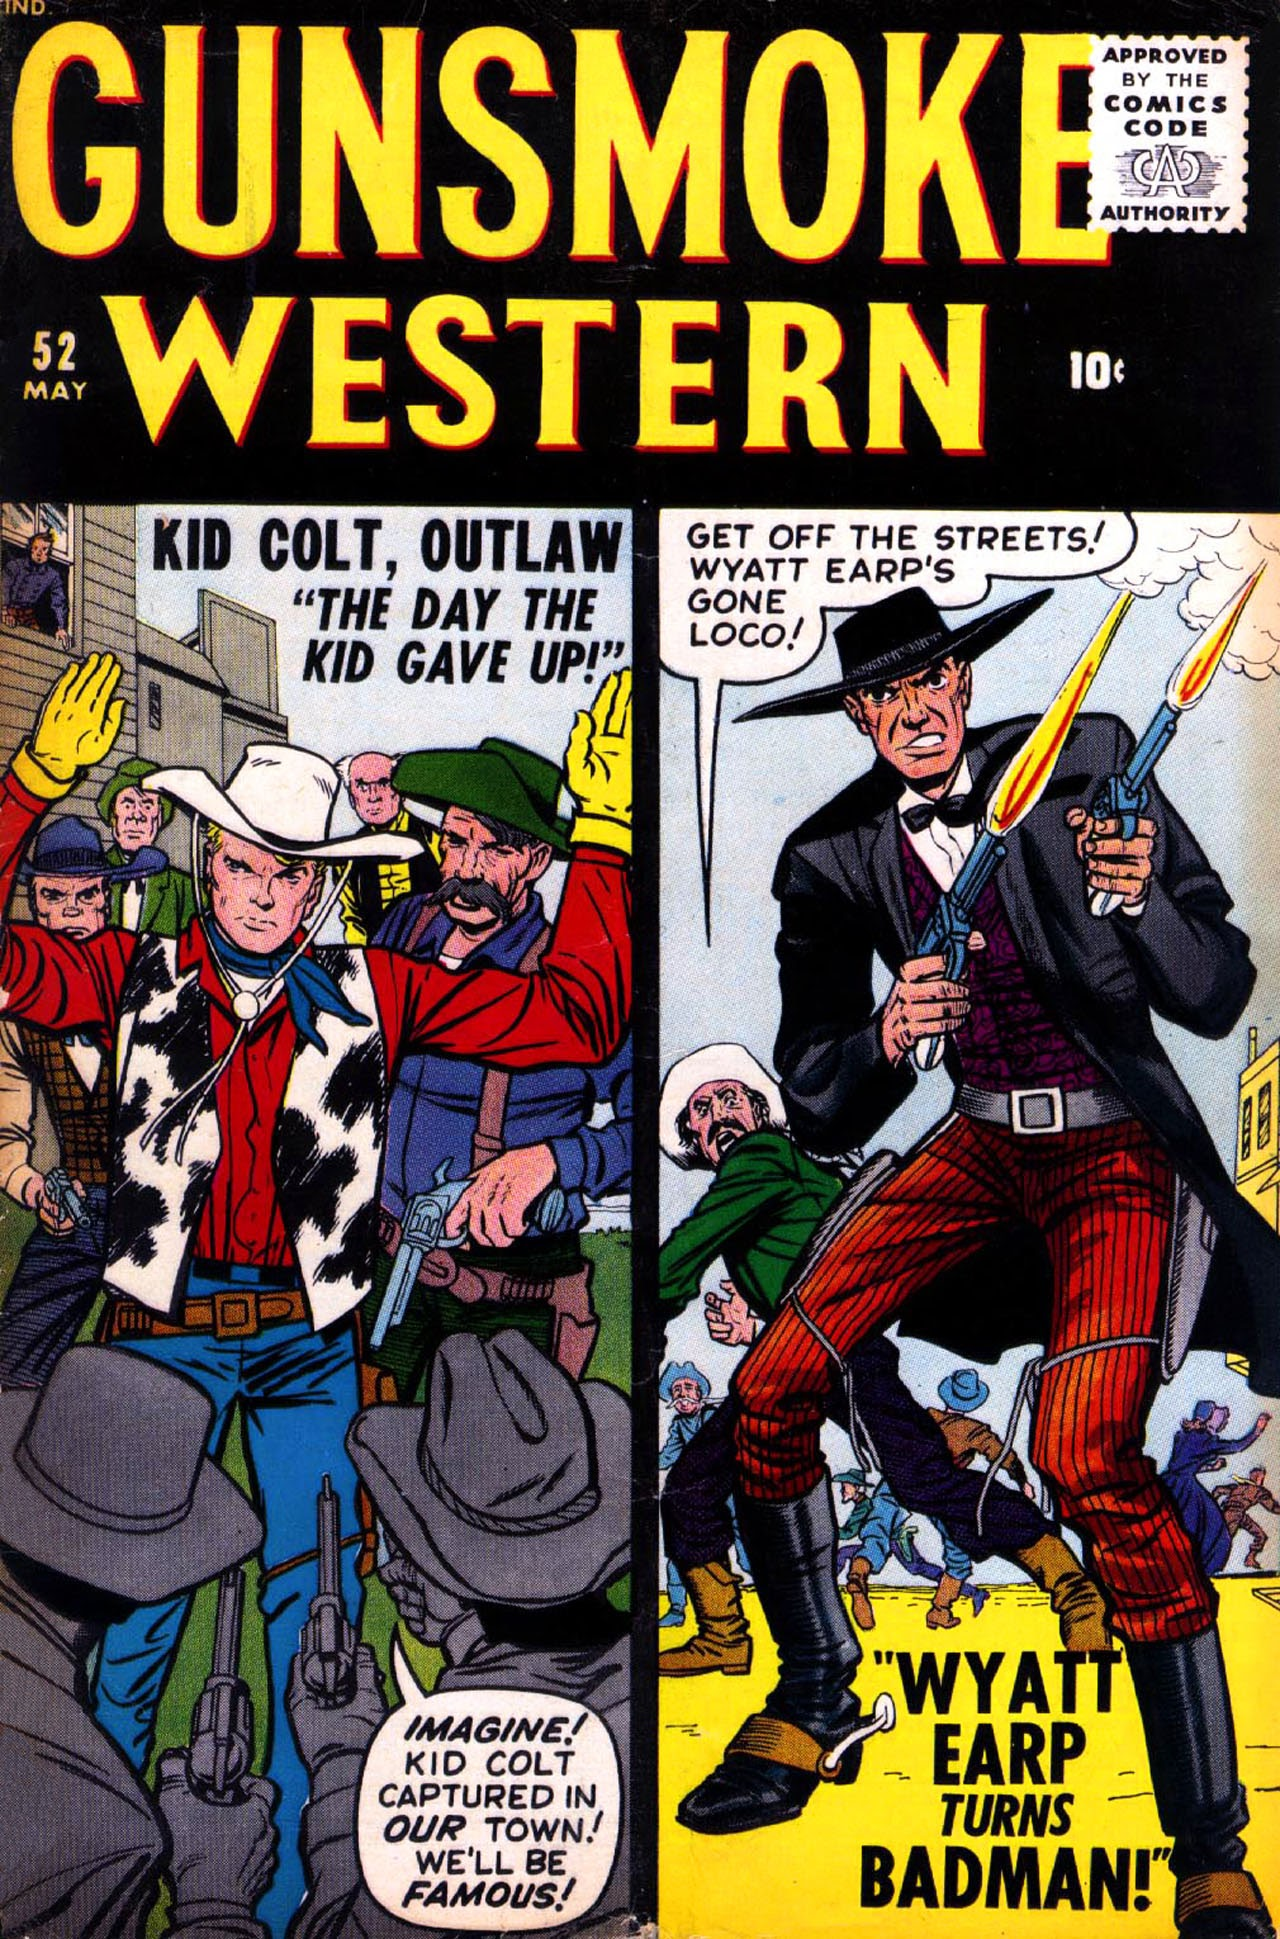 Gunsmoke Western 52 Page 1